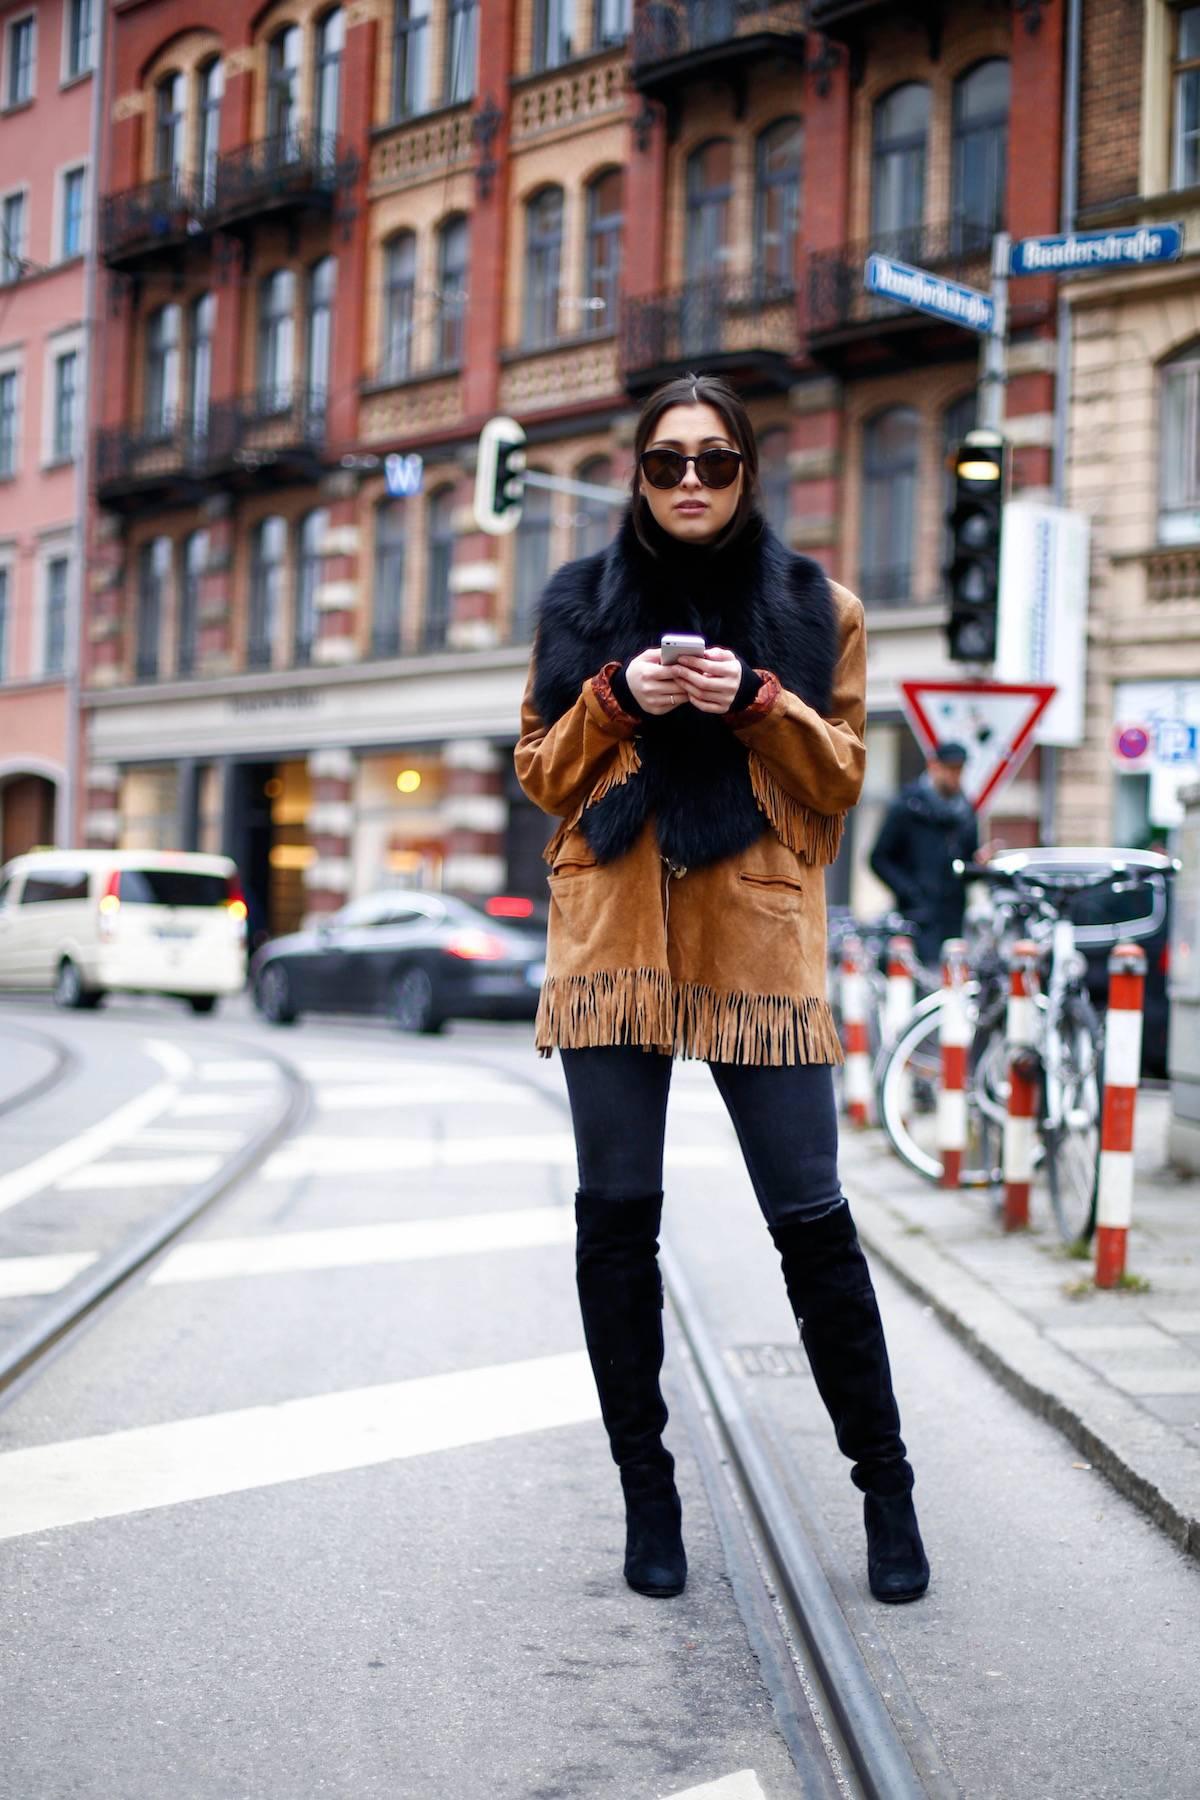 Fringed Jacket - Suede Leather - Vintage - Luxury - Overknees - Fur - Calvin Klein Sunnies - Fashionista - German Fashionblogger - Ootd - Streetstyle Munich - München Personal Style Blog - Isartor - Stilmix